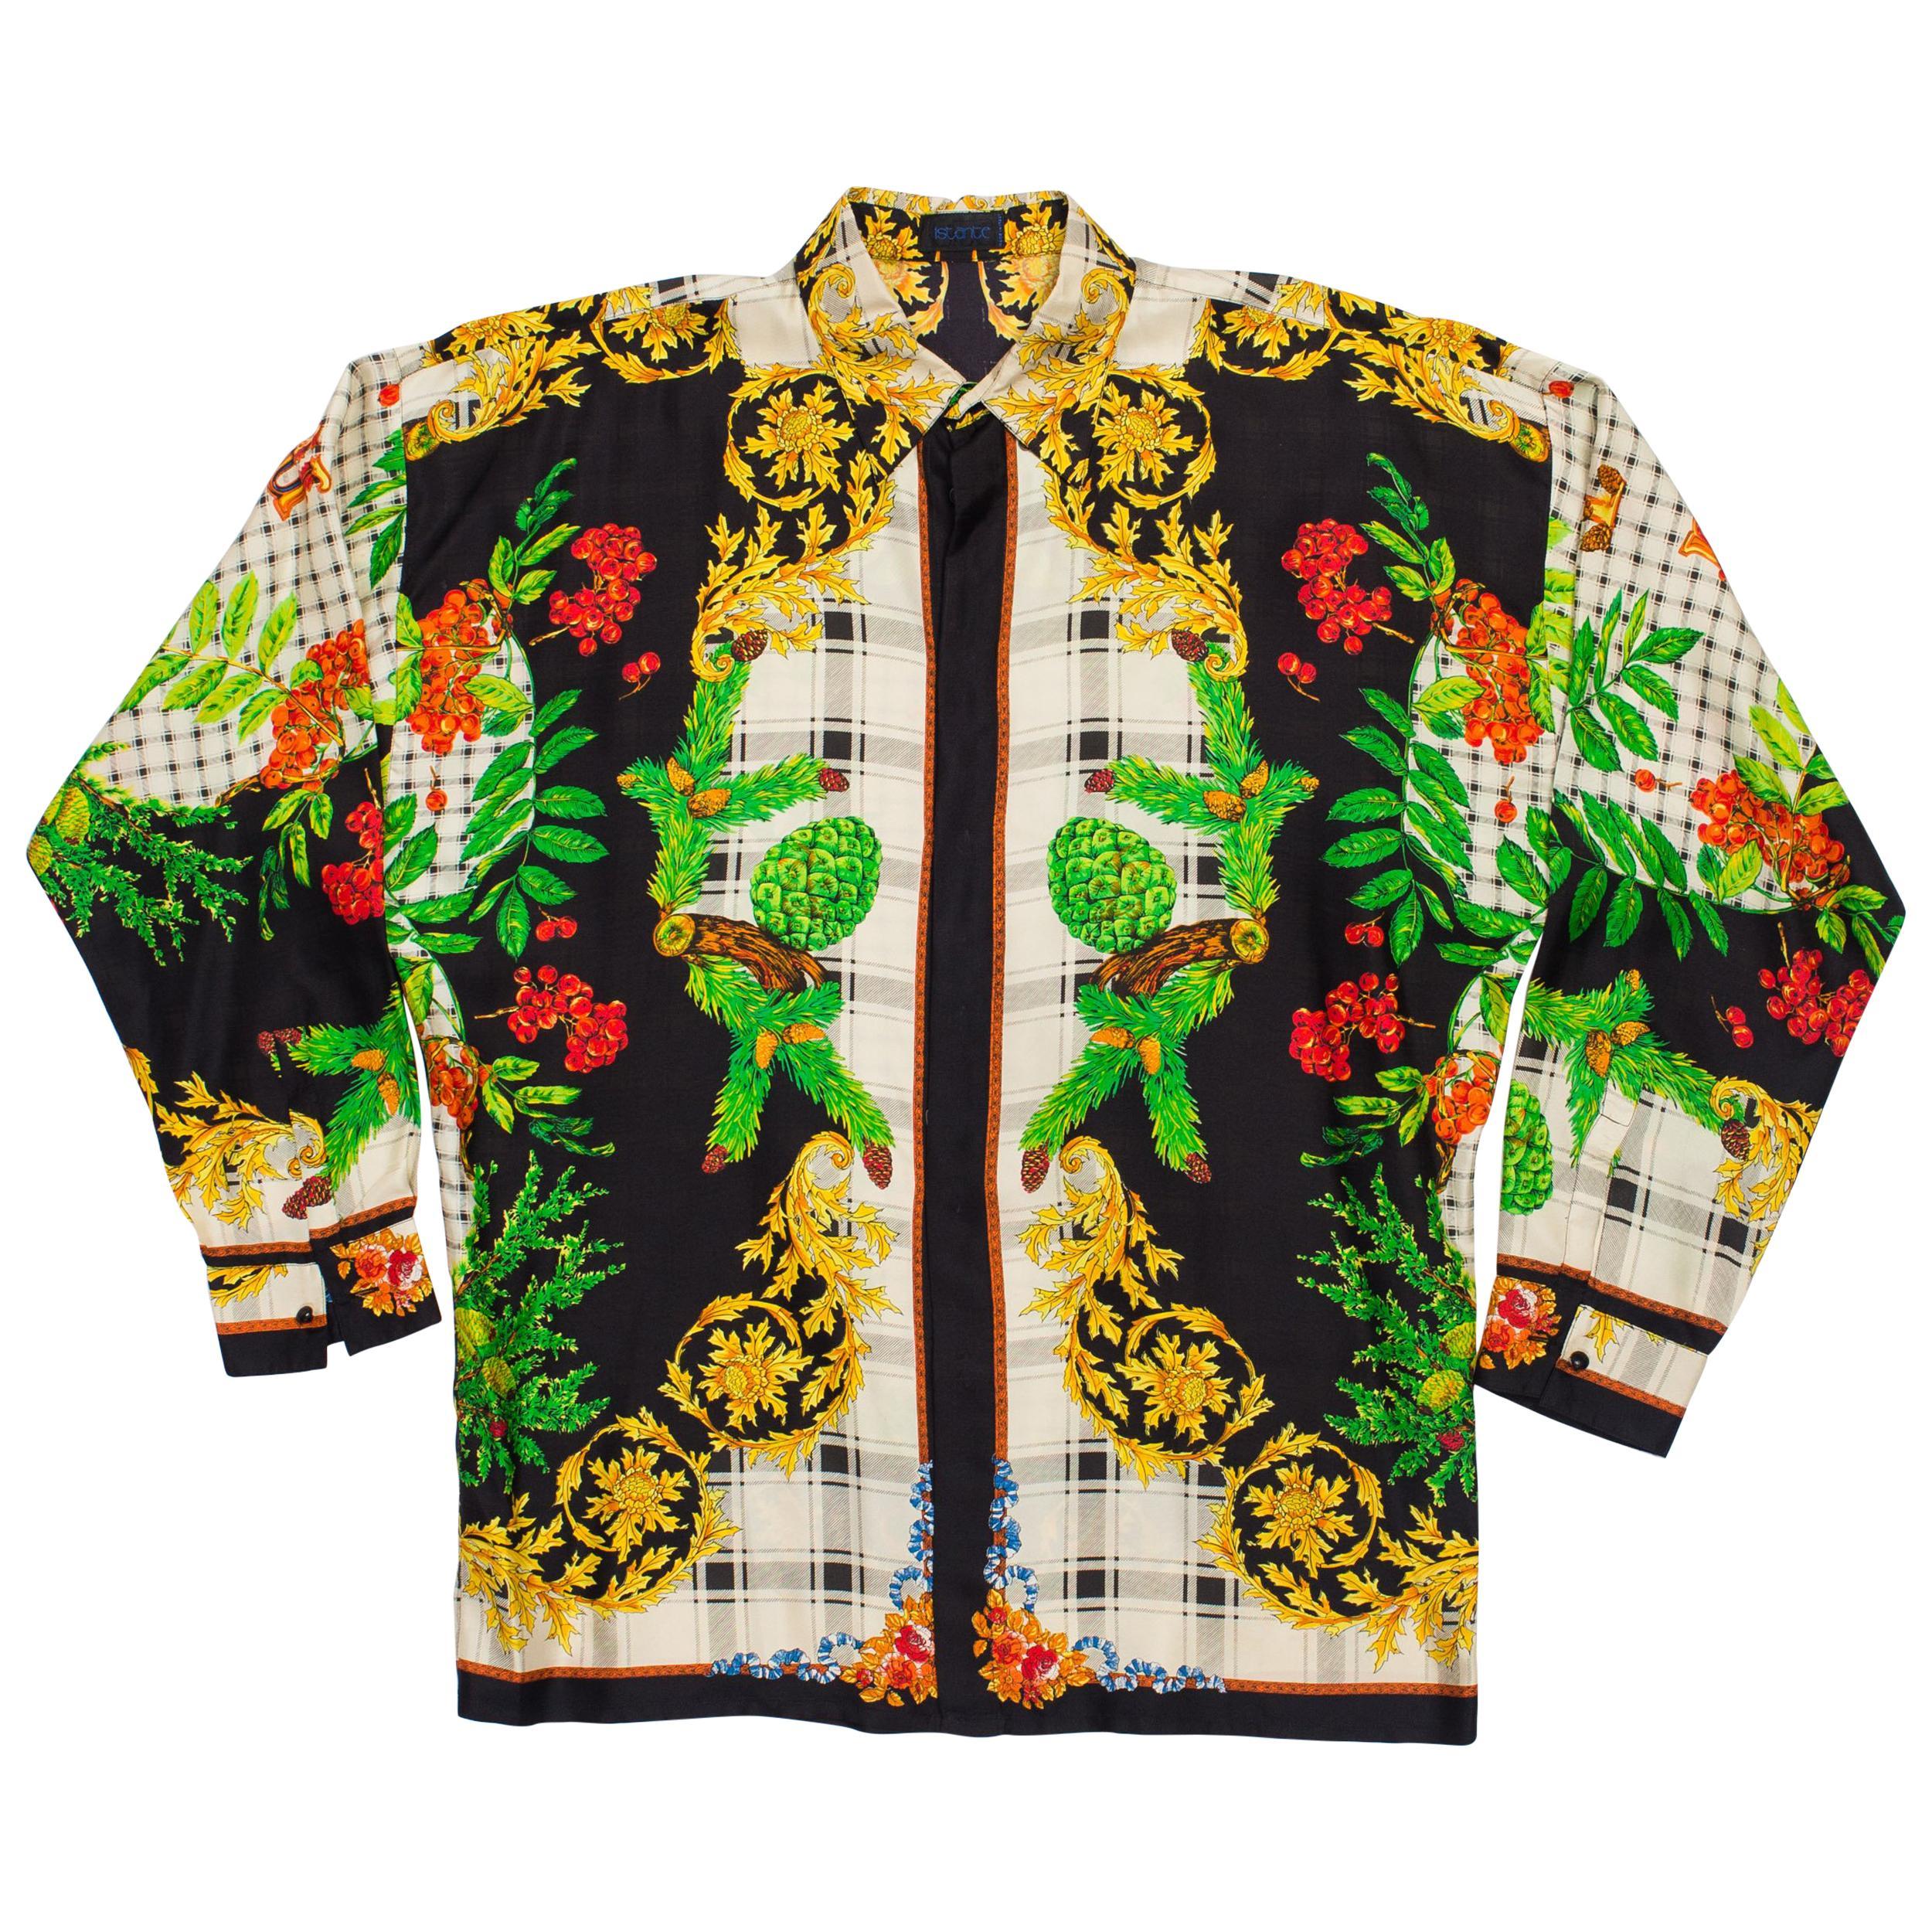 1990S GIANNI VERSACE Silk Men's Istante Autumnal Baroque Print Shirt Sz 48